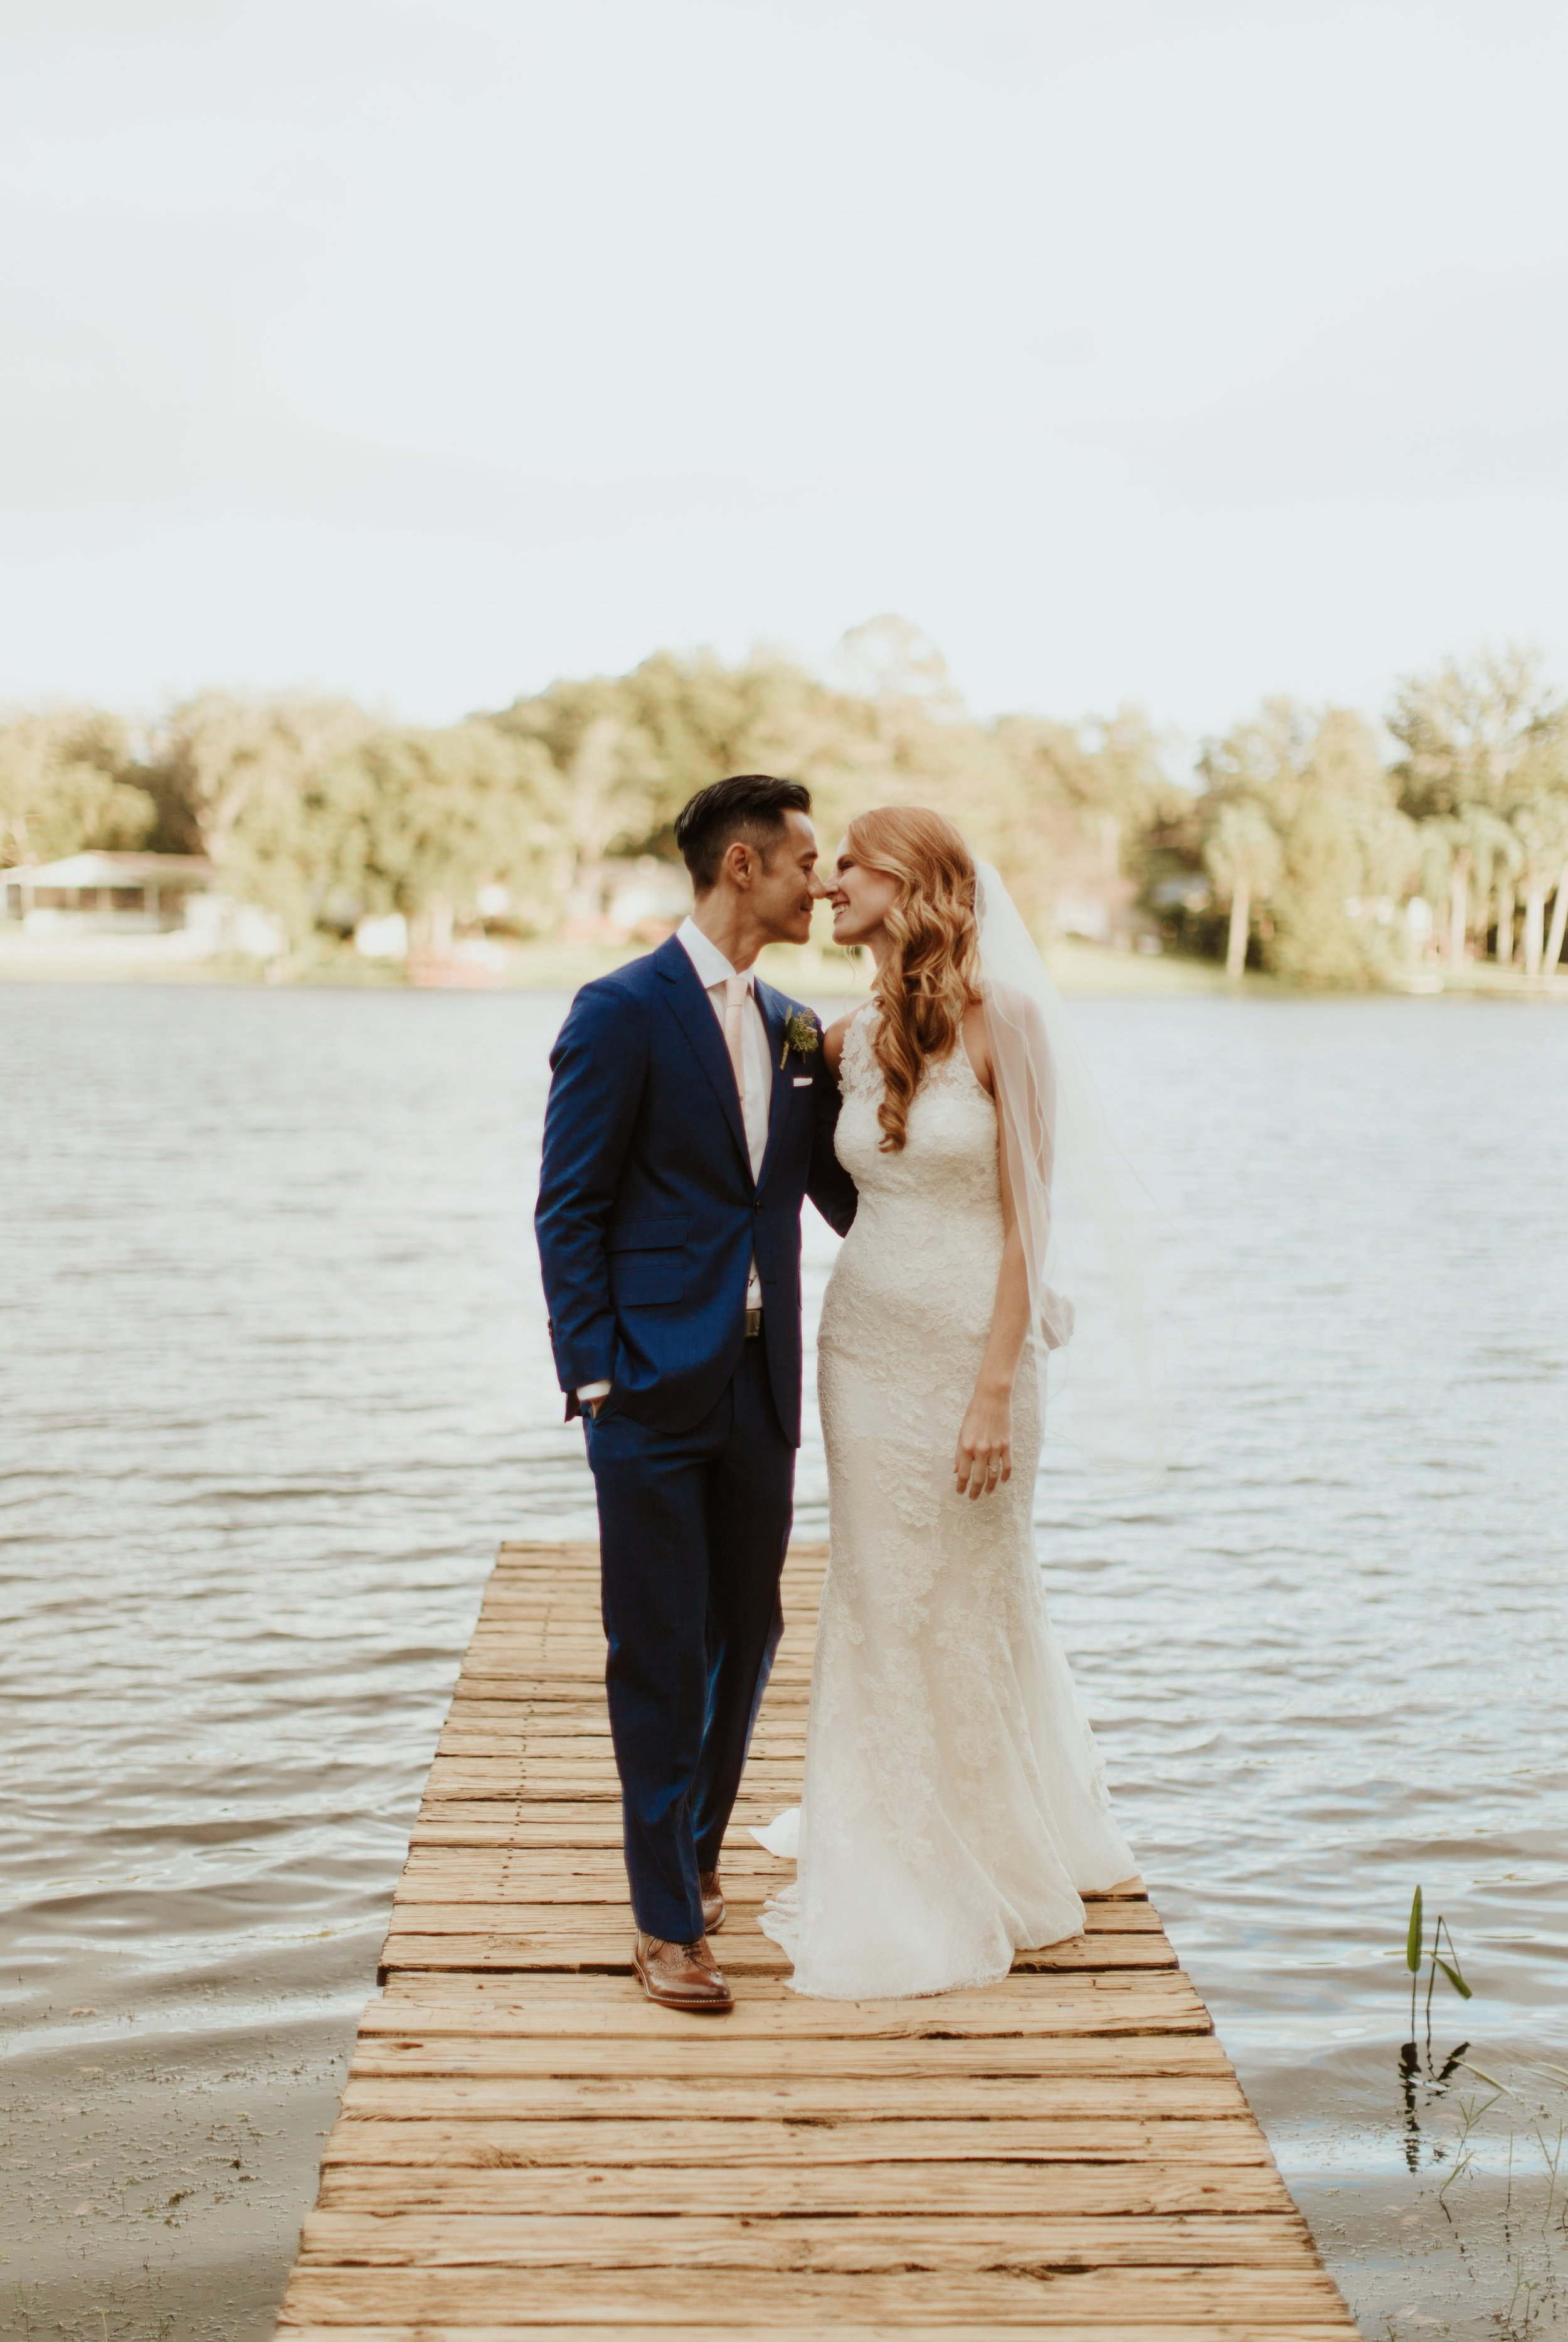 Wedding Day | Vanessa Boy | vanessaboy.com-813.com .jpg